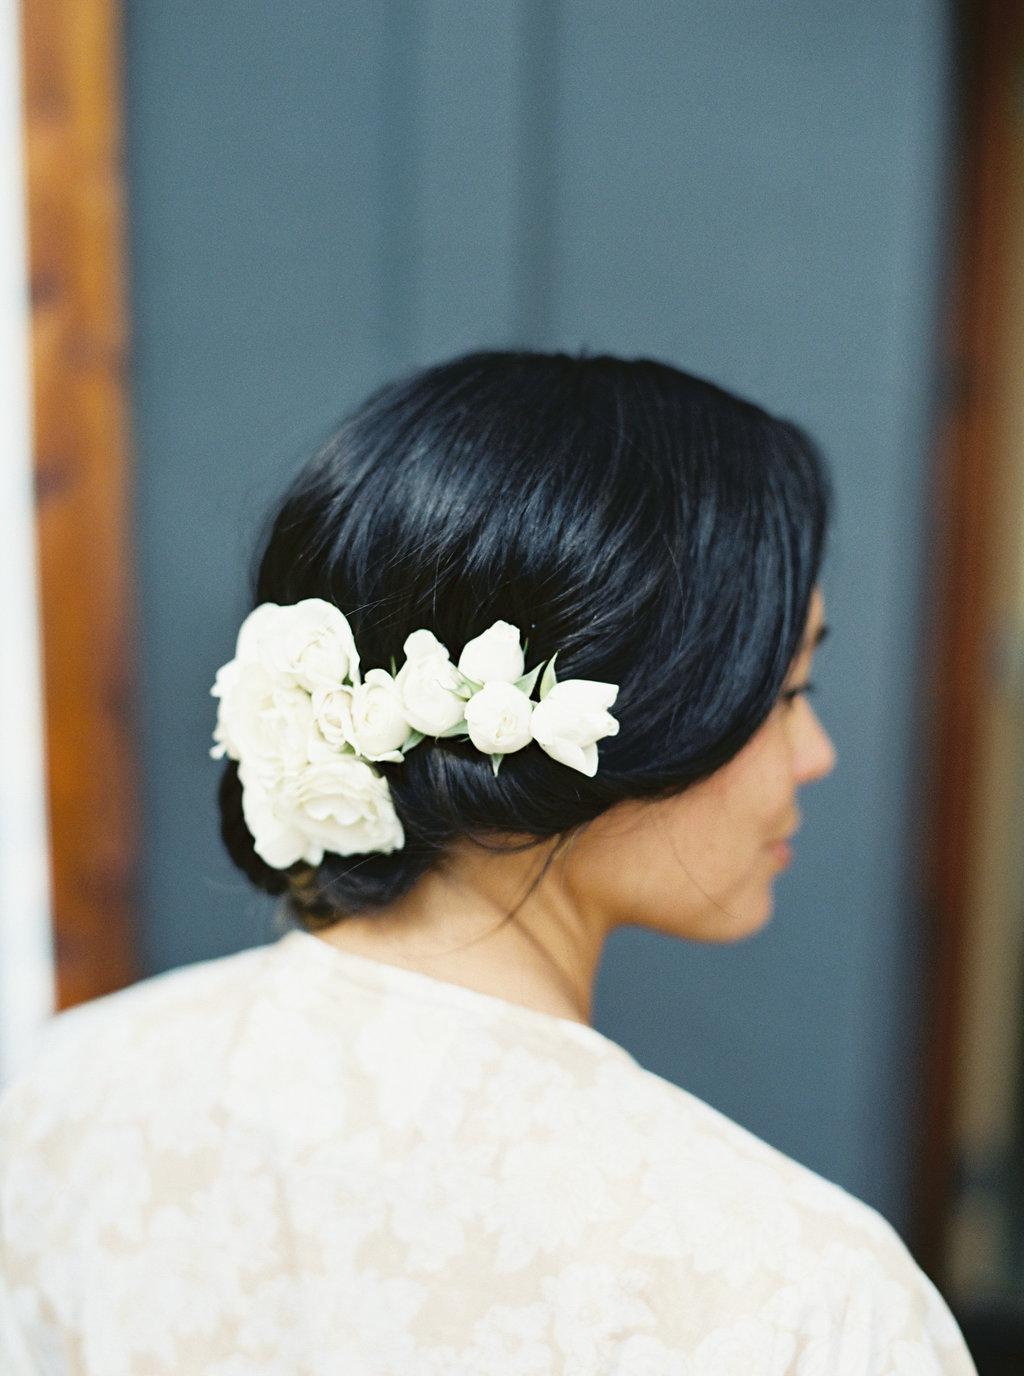 000008_gallardo_wedding_film0069.jpg